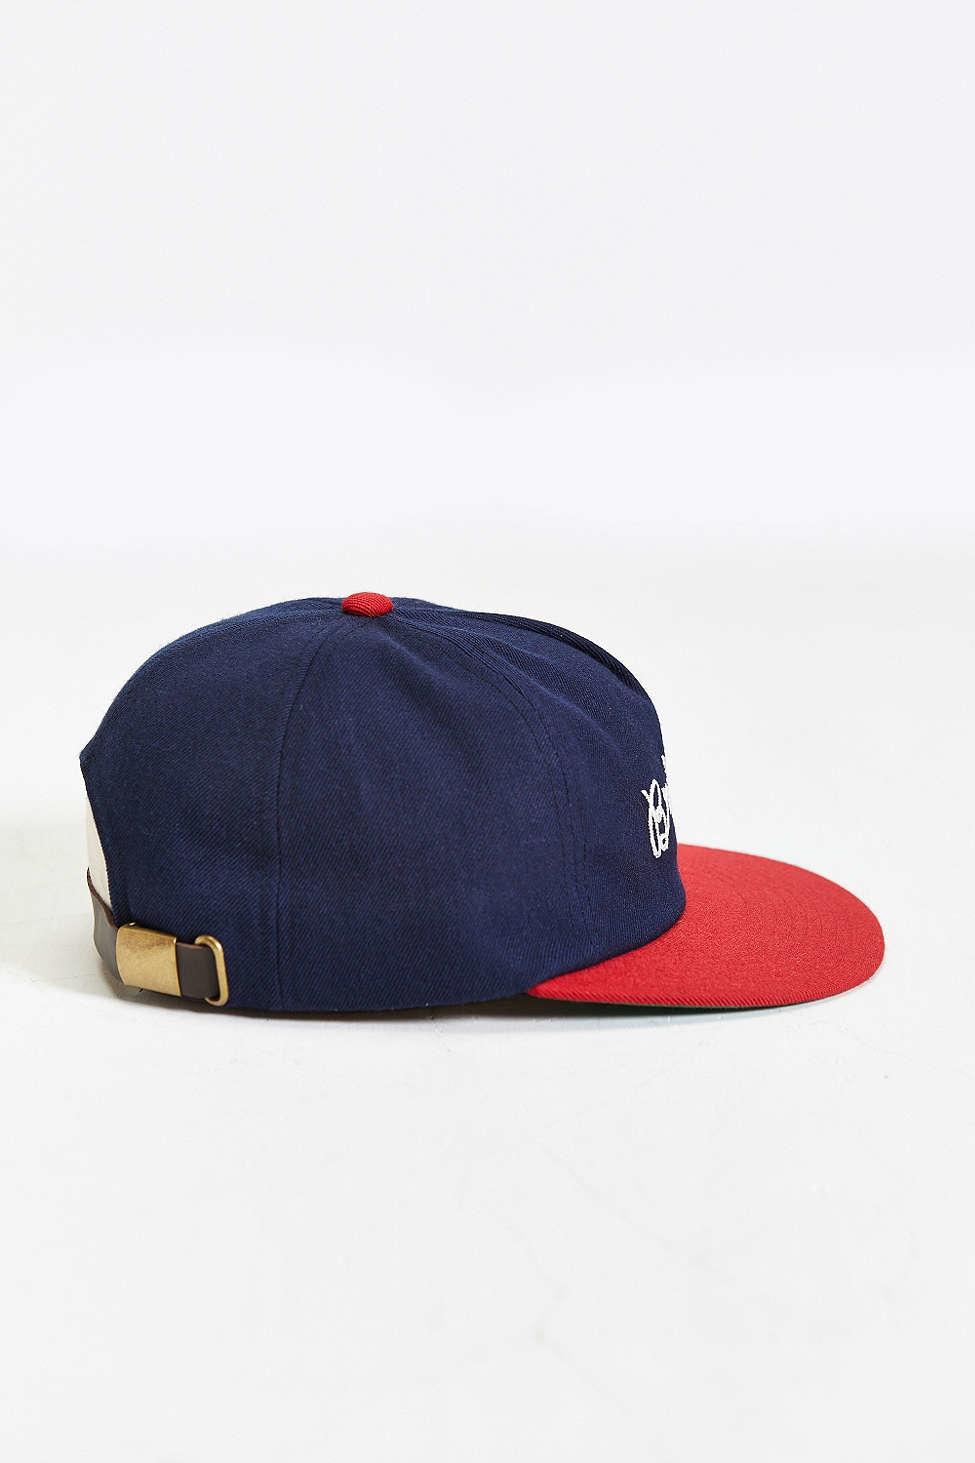 Brixton Robinson Strapback Hat in Blue - Lyst d9832c1c2d0